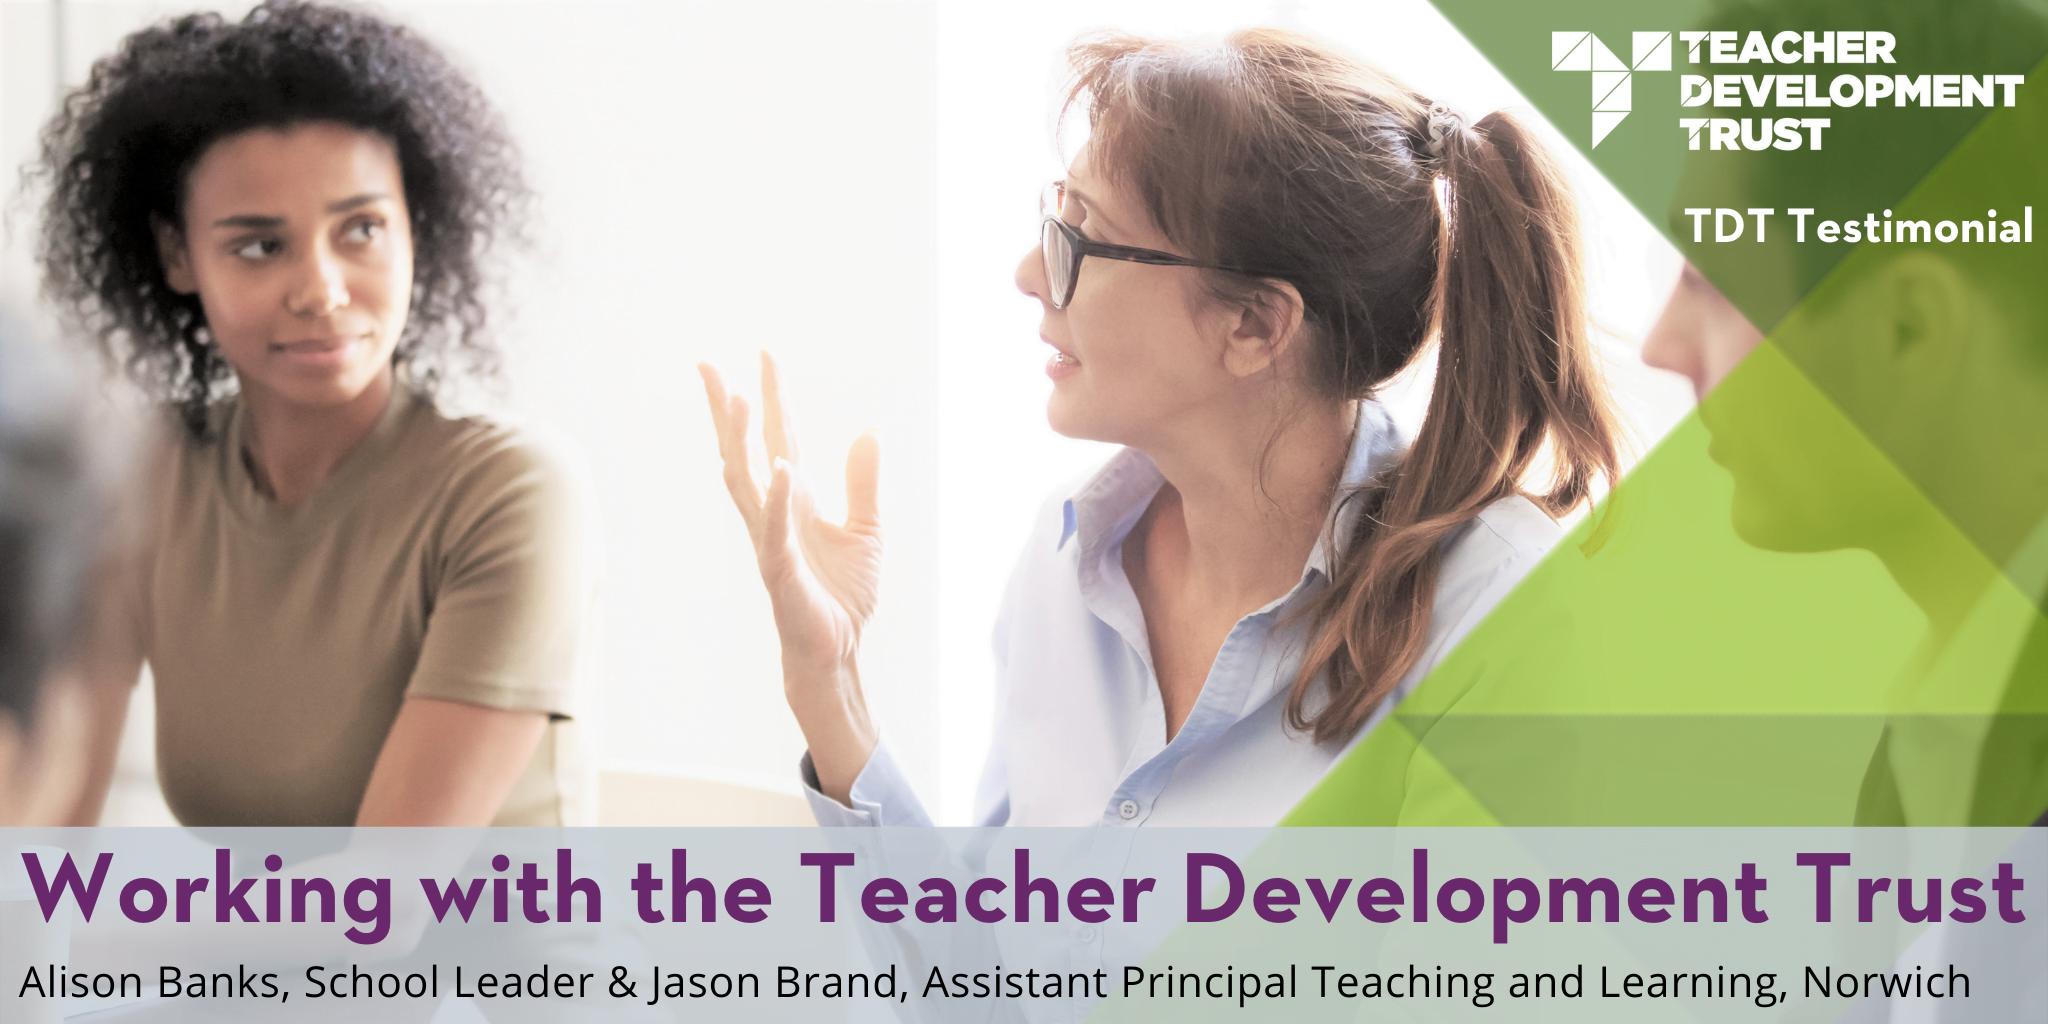 TDT Testimonial: Working with the Teacher Development Trust